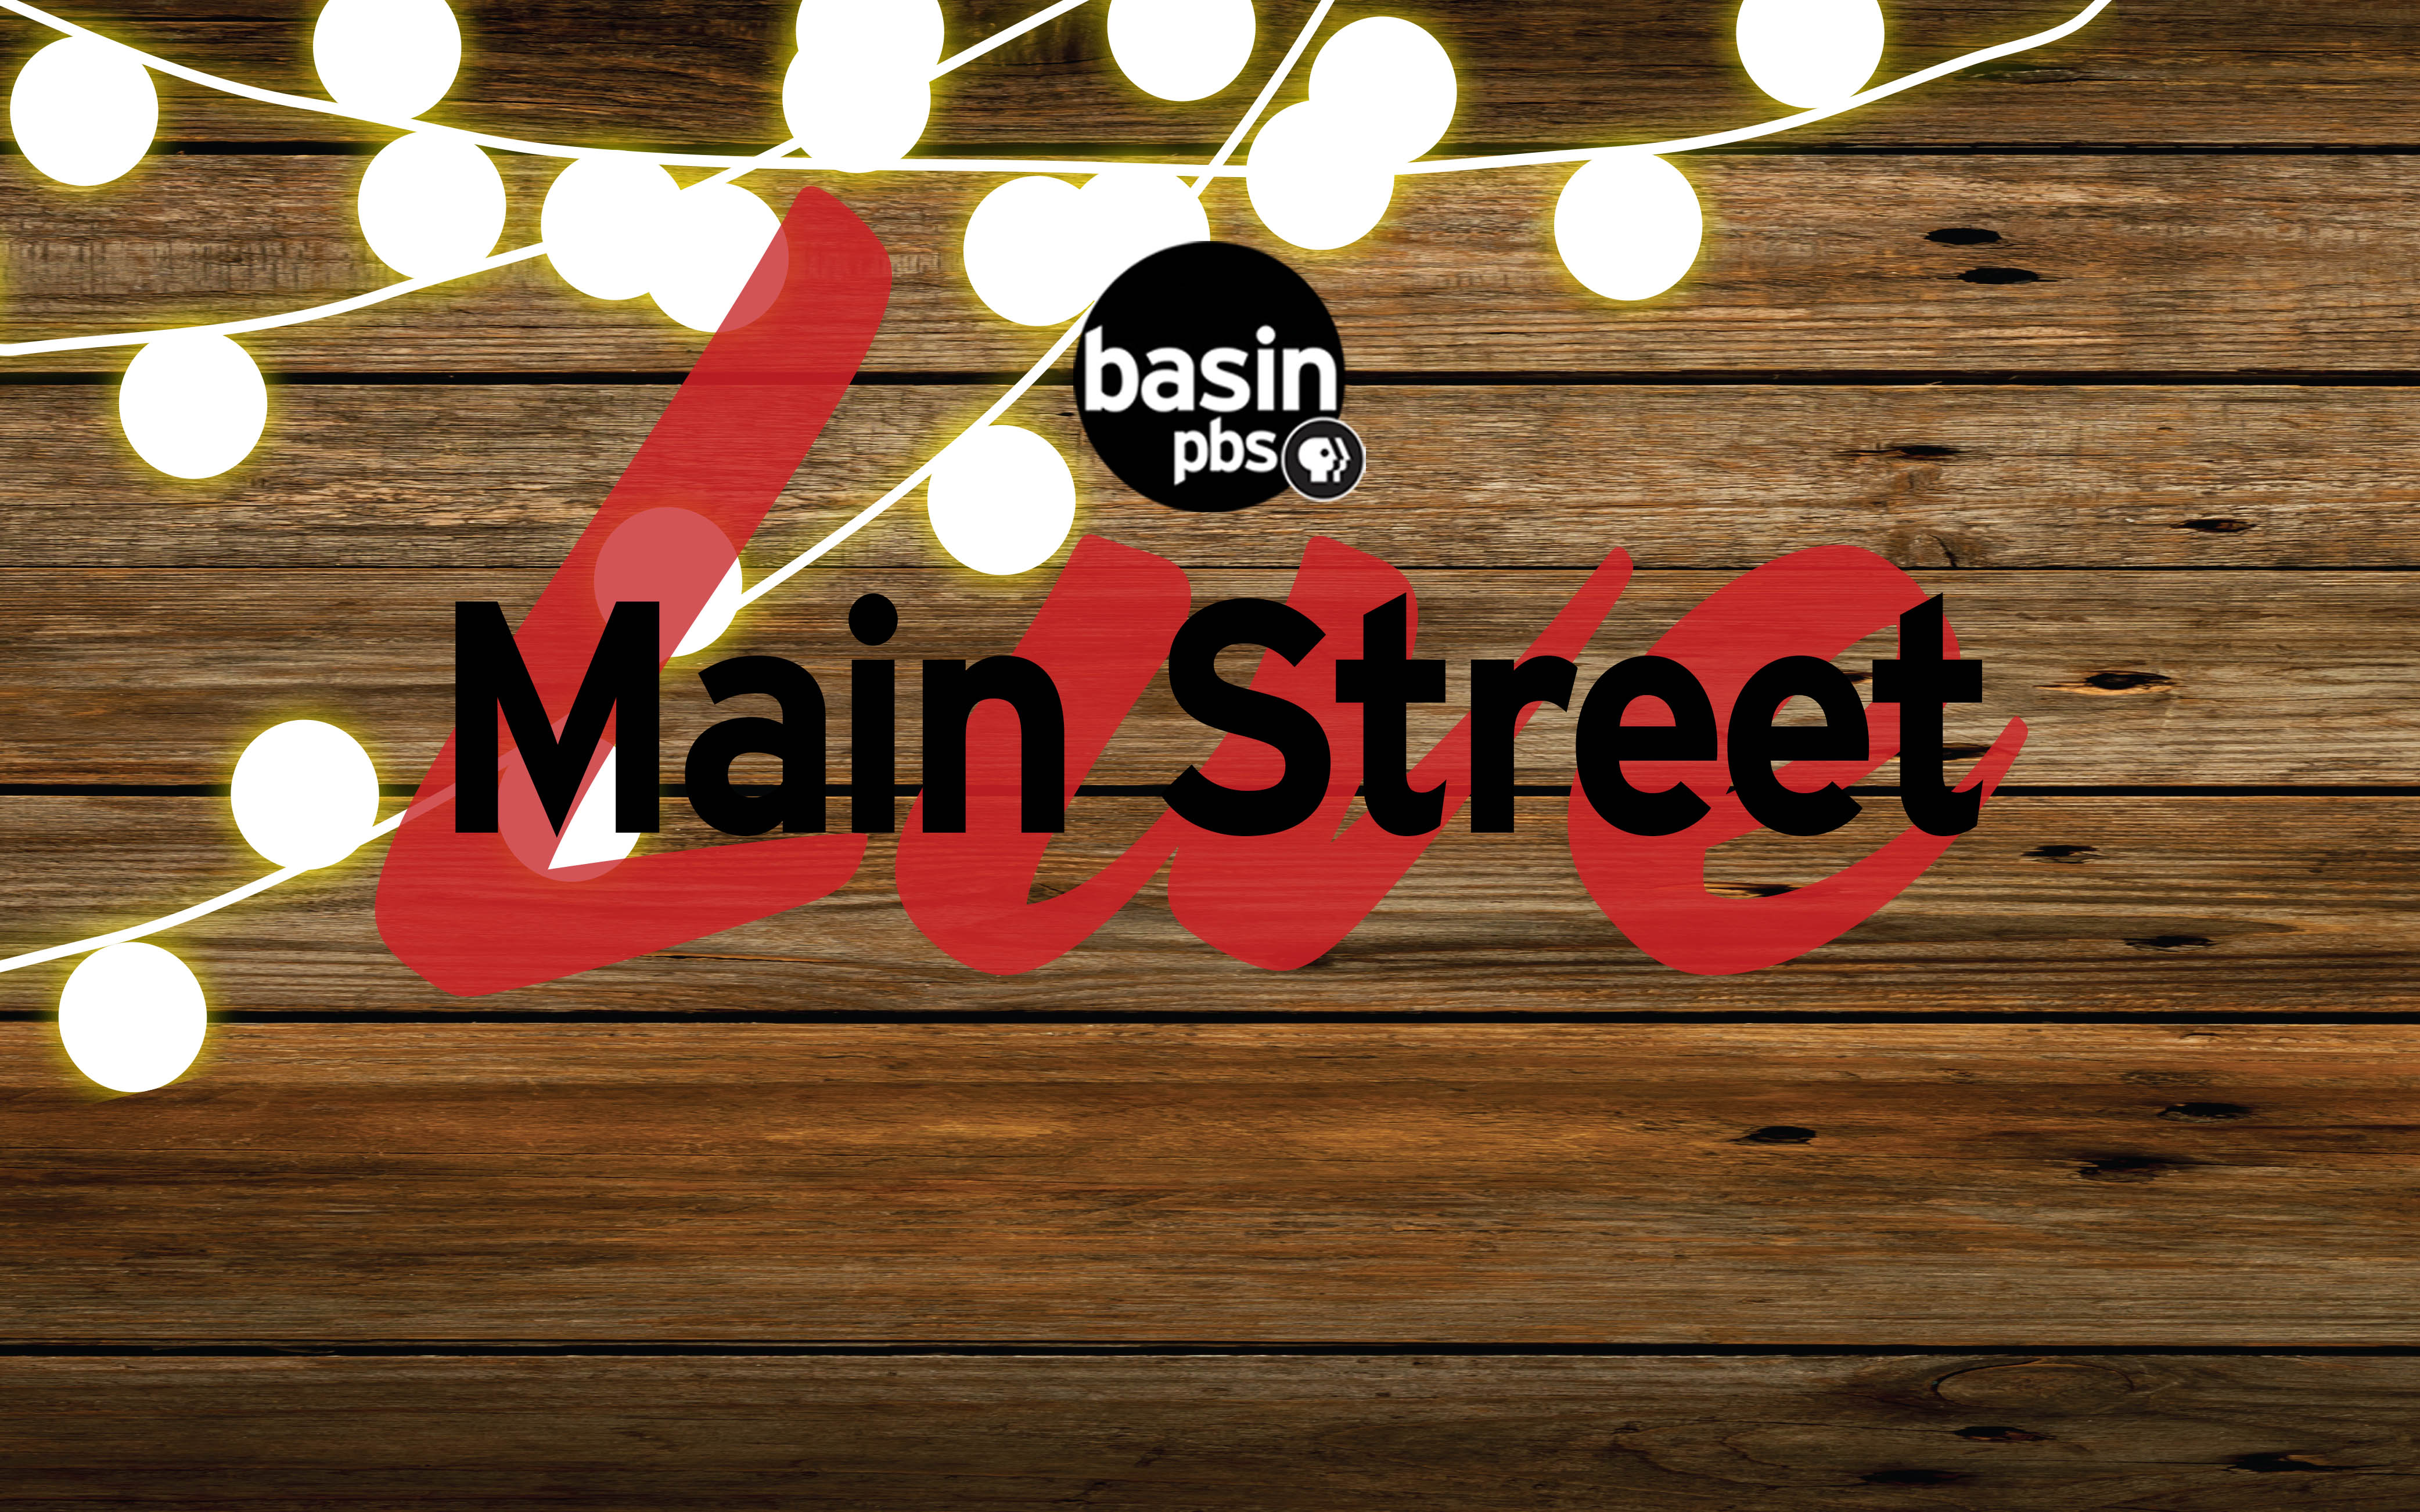 Main Street Live - May 23